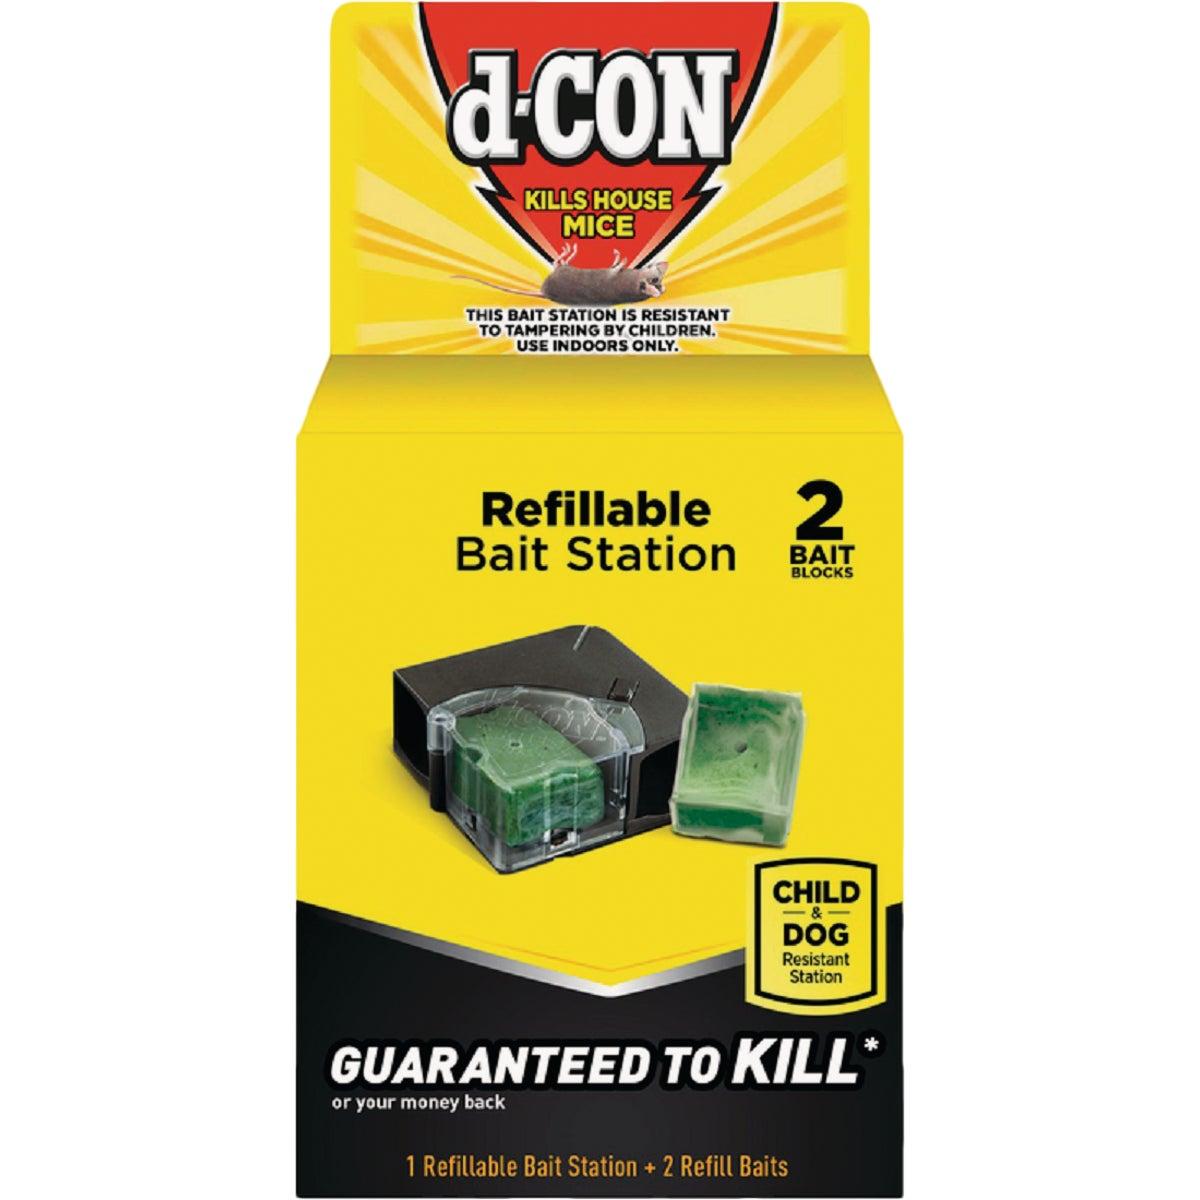 Dcon 2 Ref Bait Station